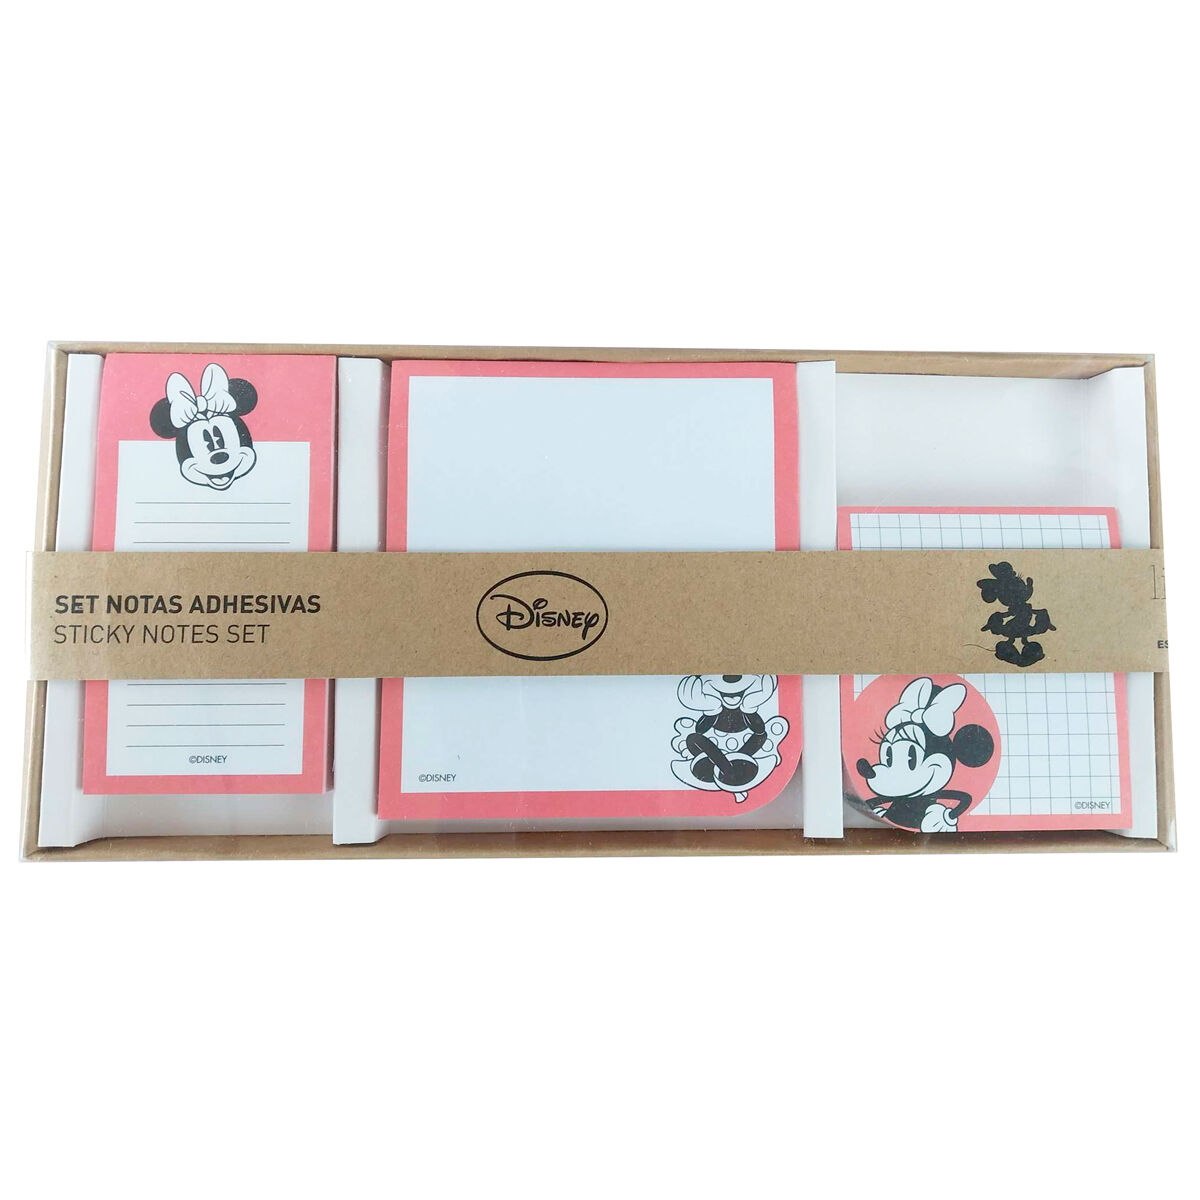 Disney Minnie sticky notes